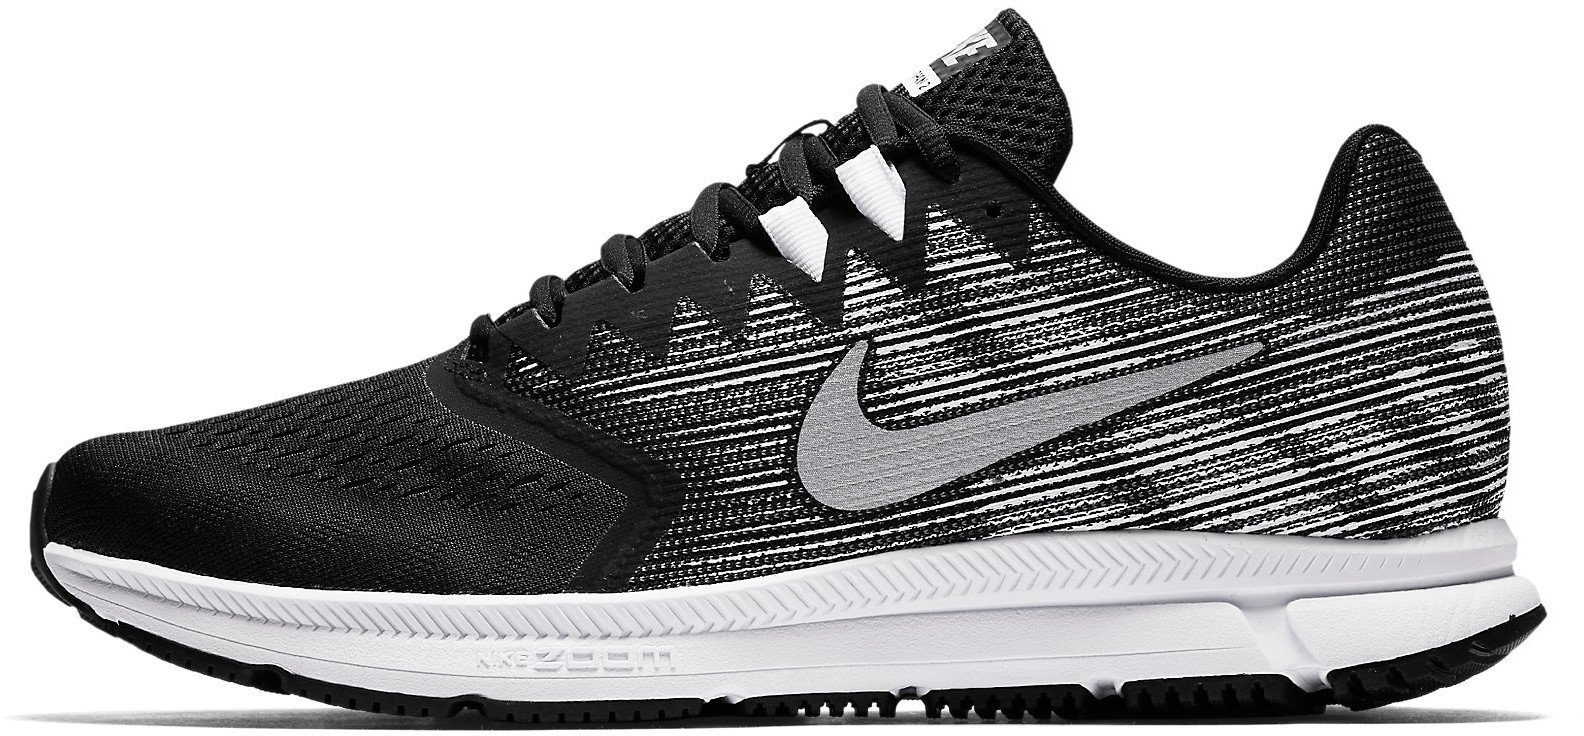 Running shoes Nike ZOOM SPAN 2 - Top4Running.com